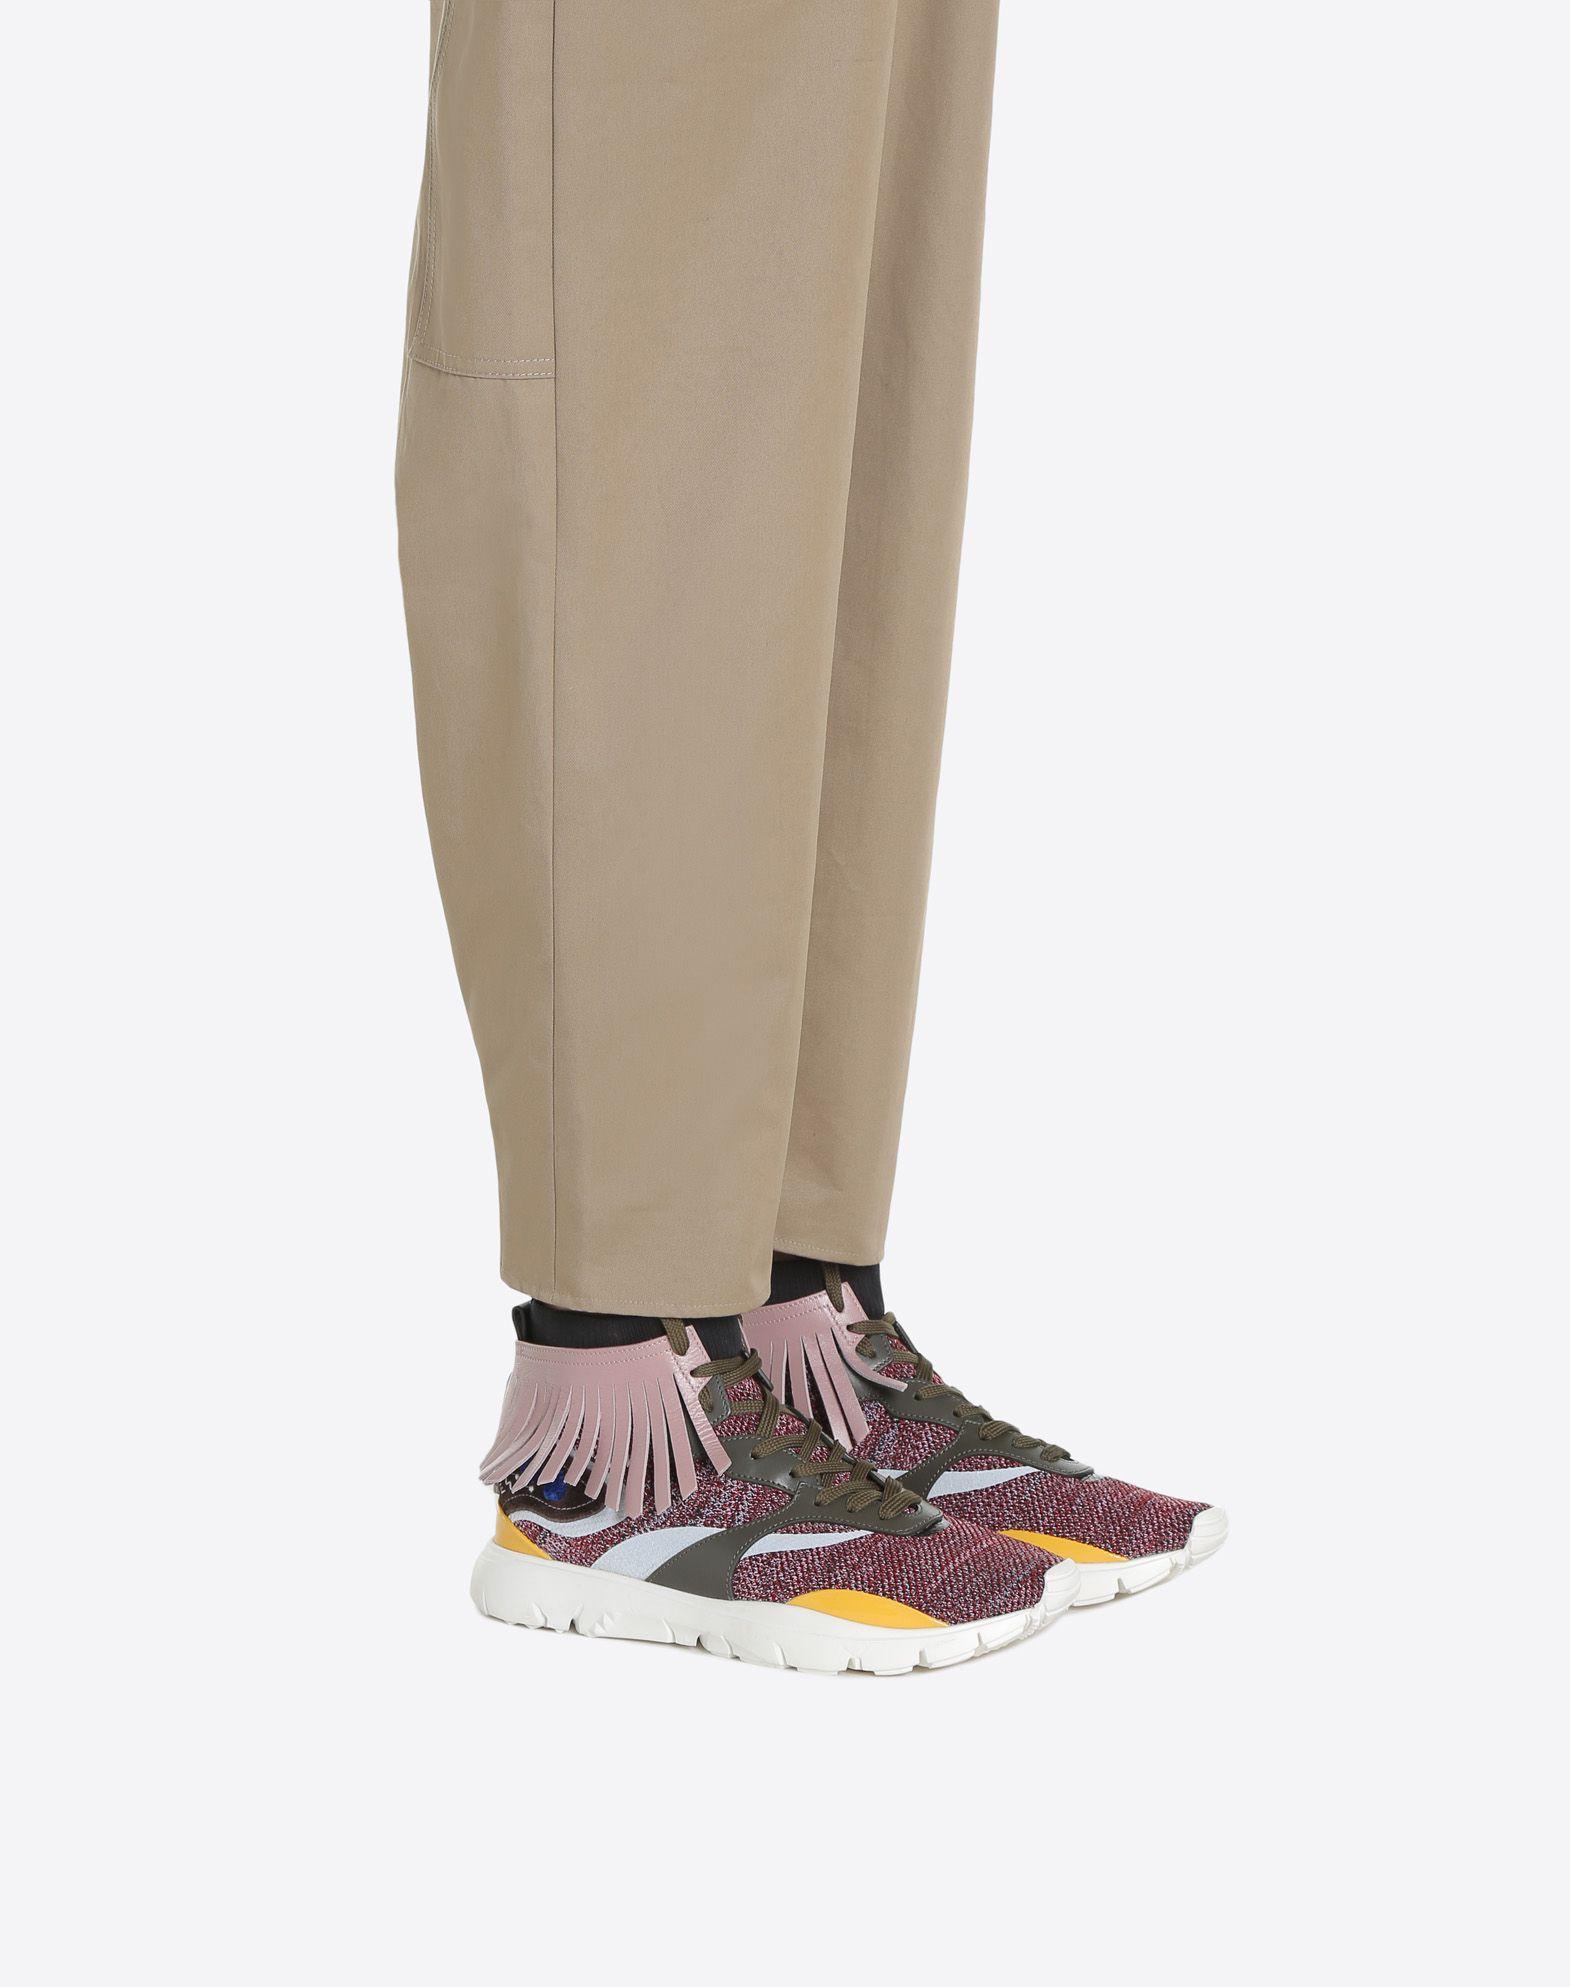 VALENTINO GARAVANI UOMO Heroes Tribe 运动鞋 运动鞋 U a